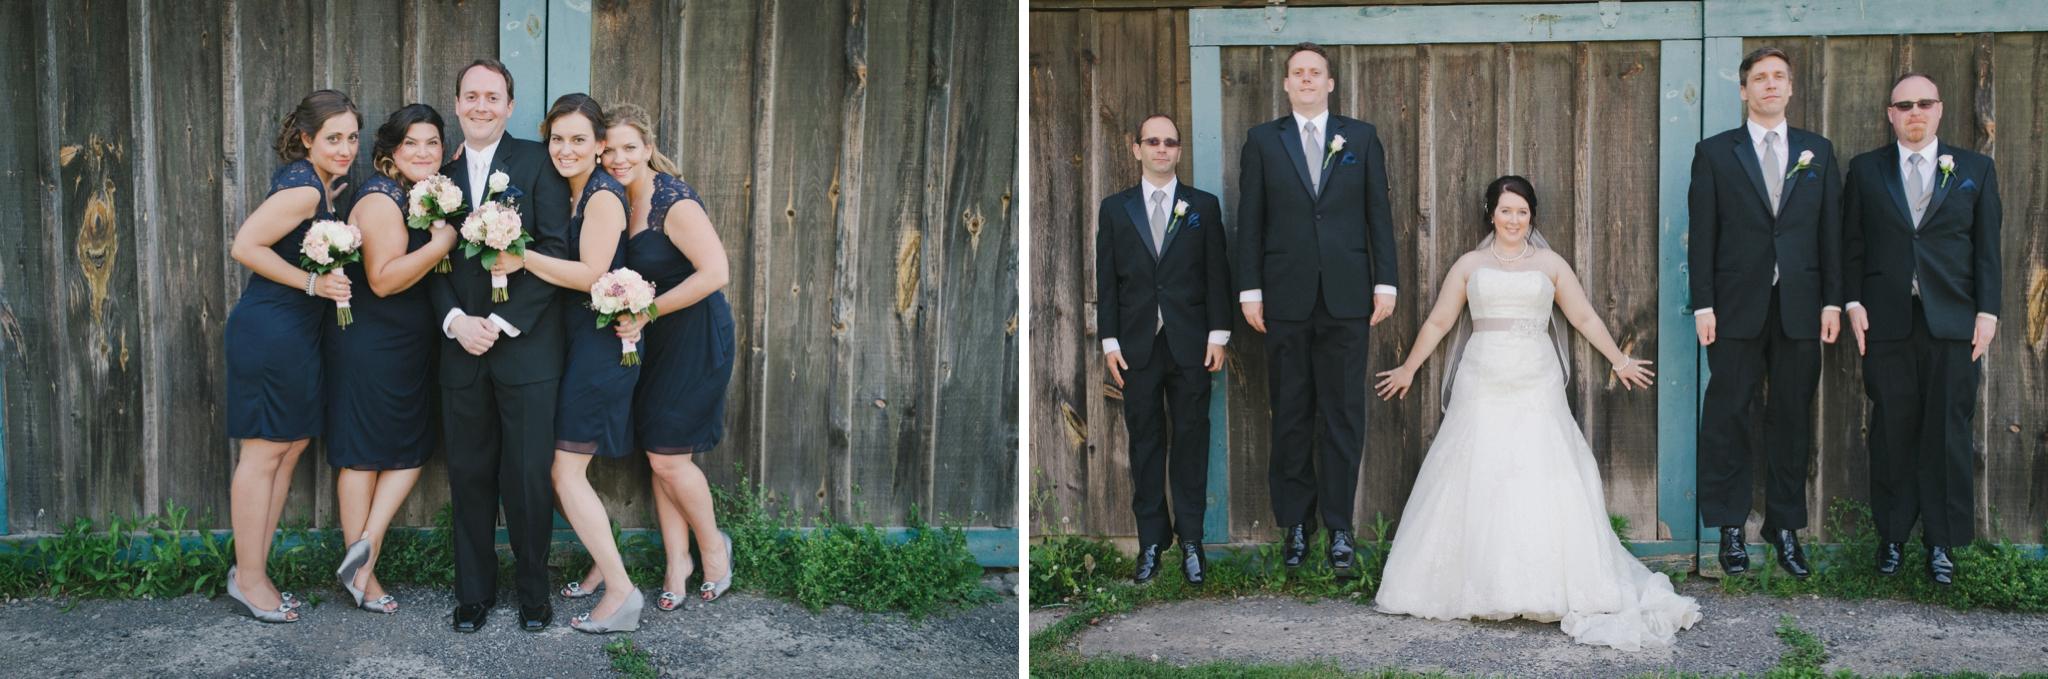 30-cute-bridal-party-photos-hernder.jpg